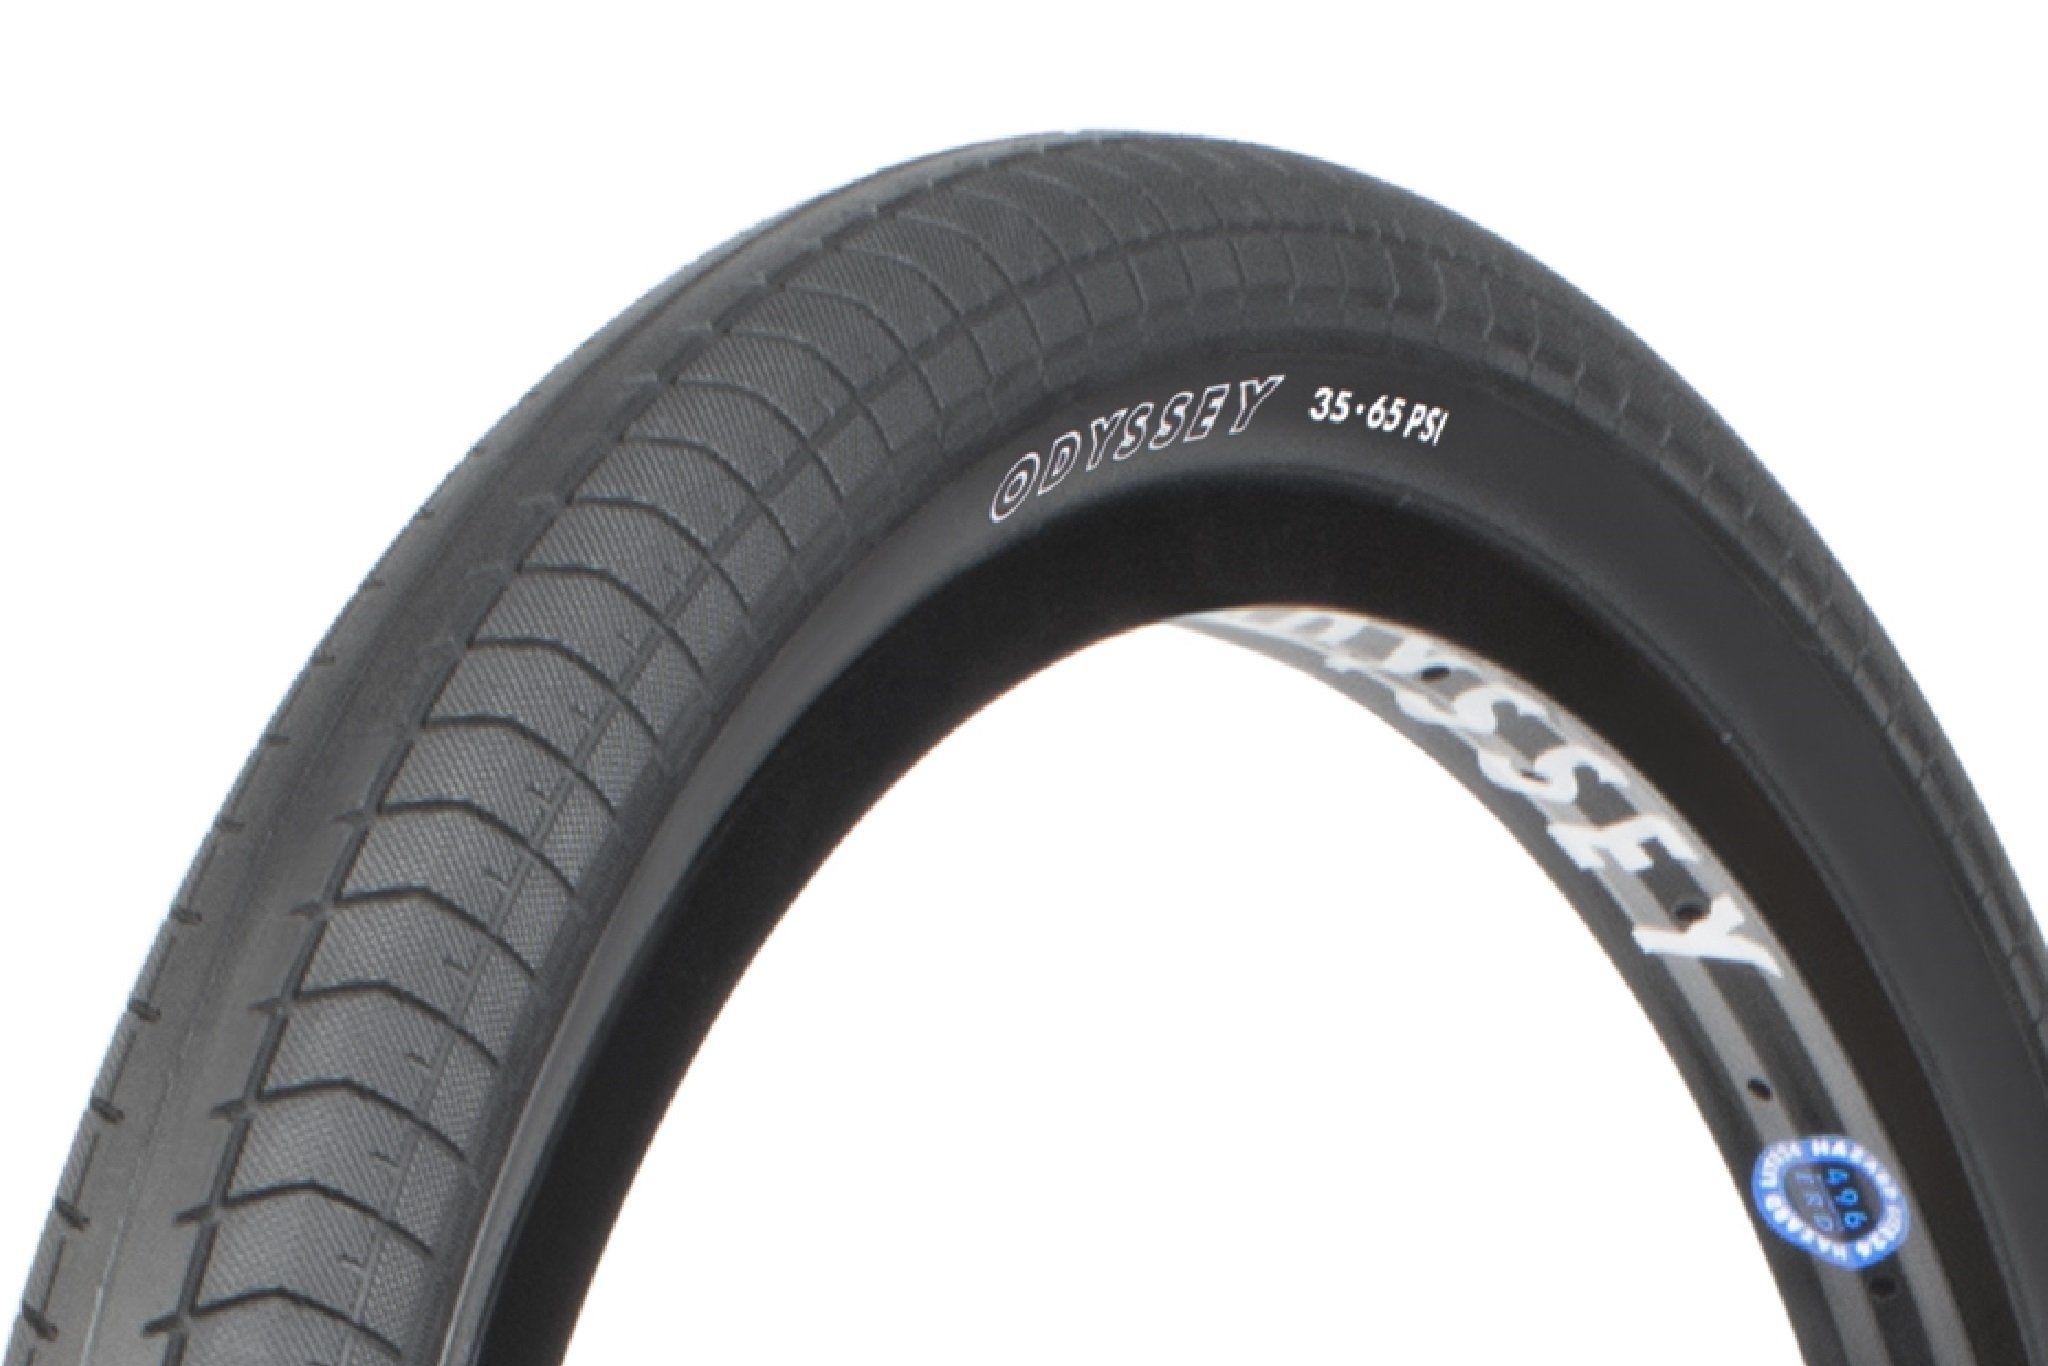 "Odyssey Path Pro 24"" Cruiser Tire"